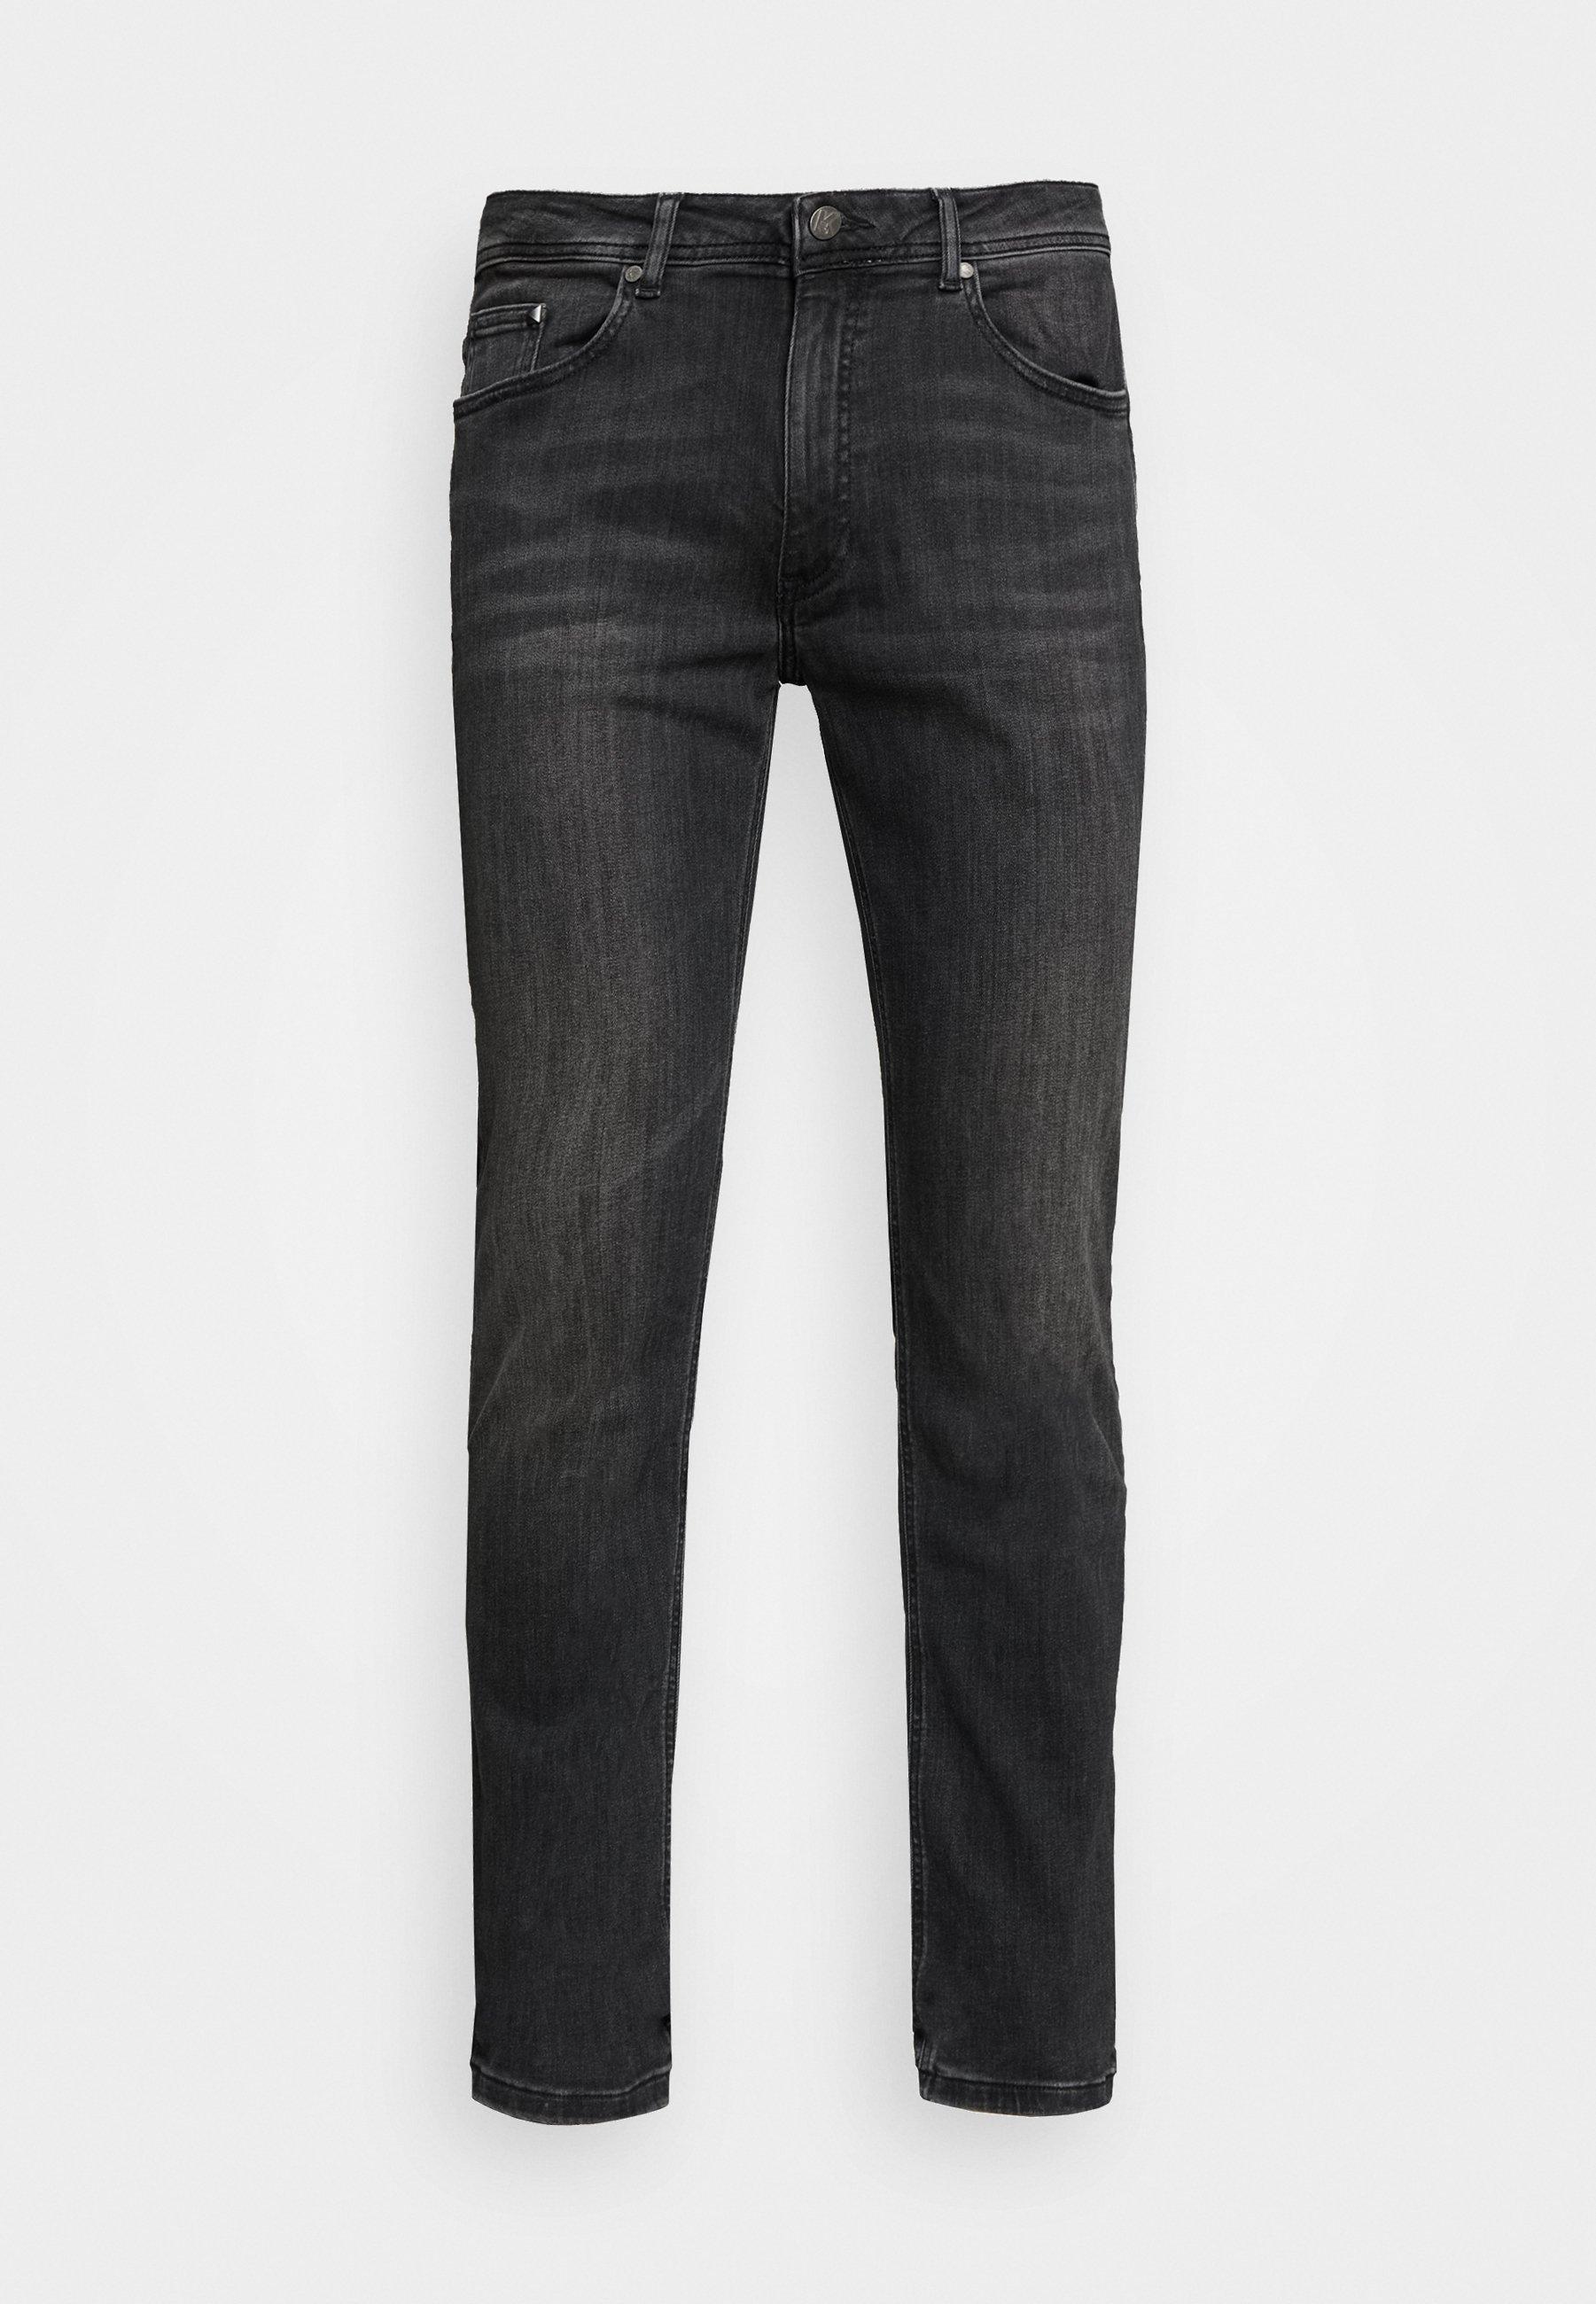 KARL LAGERFELD 5 POCKET - Jean slim - grey